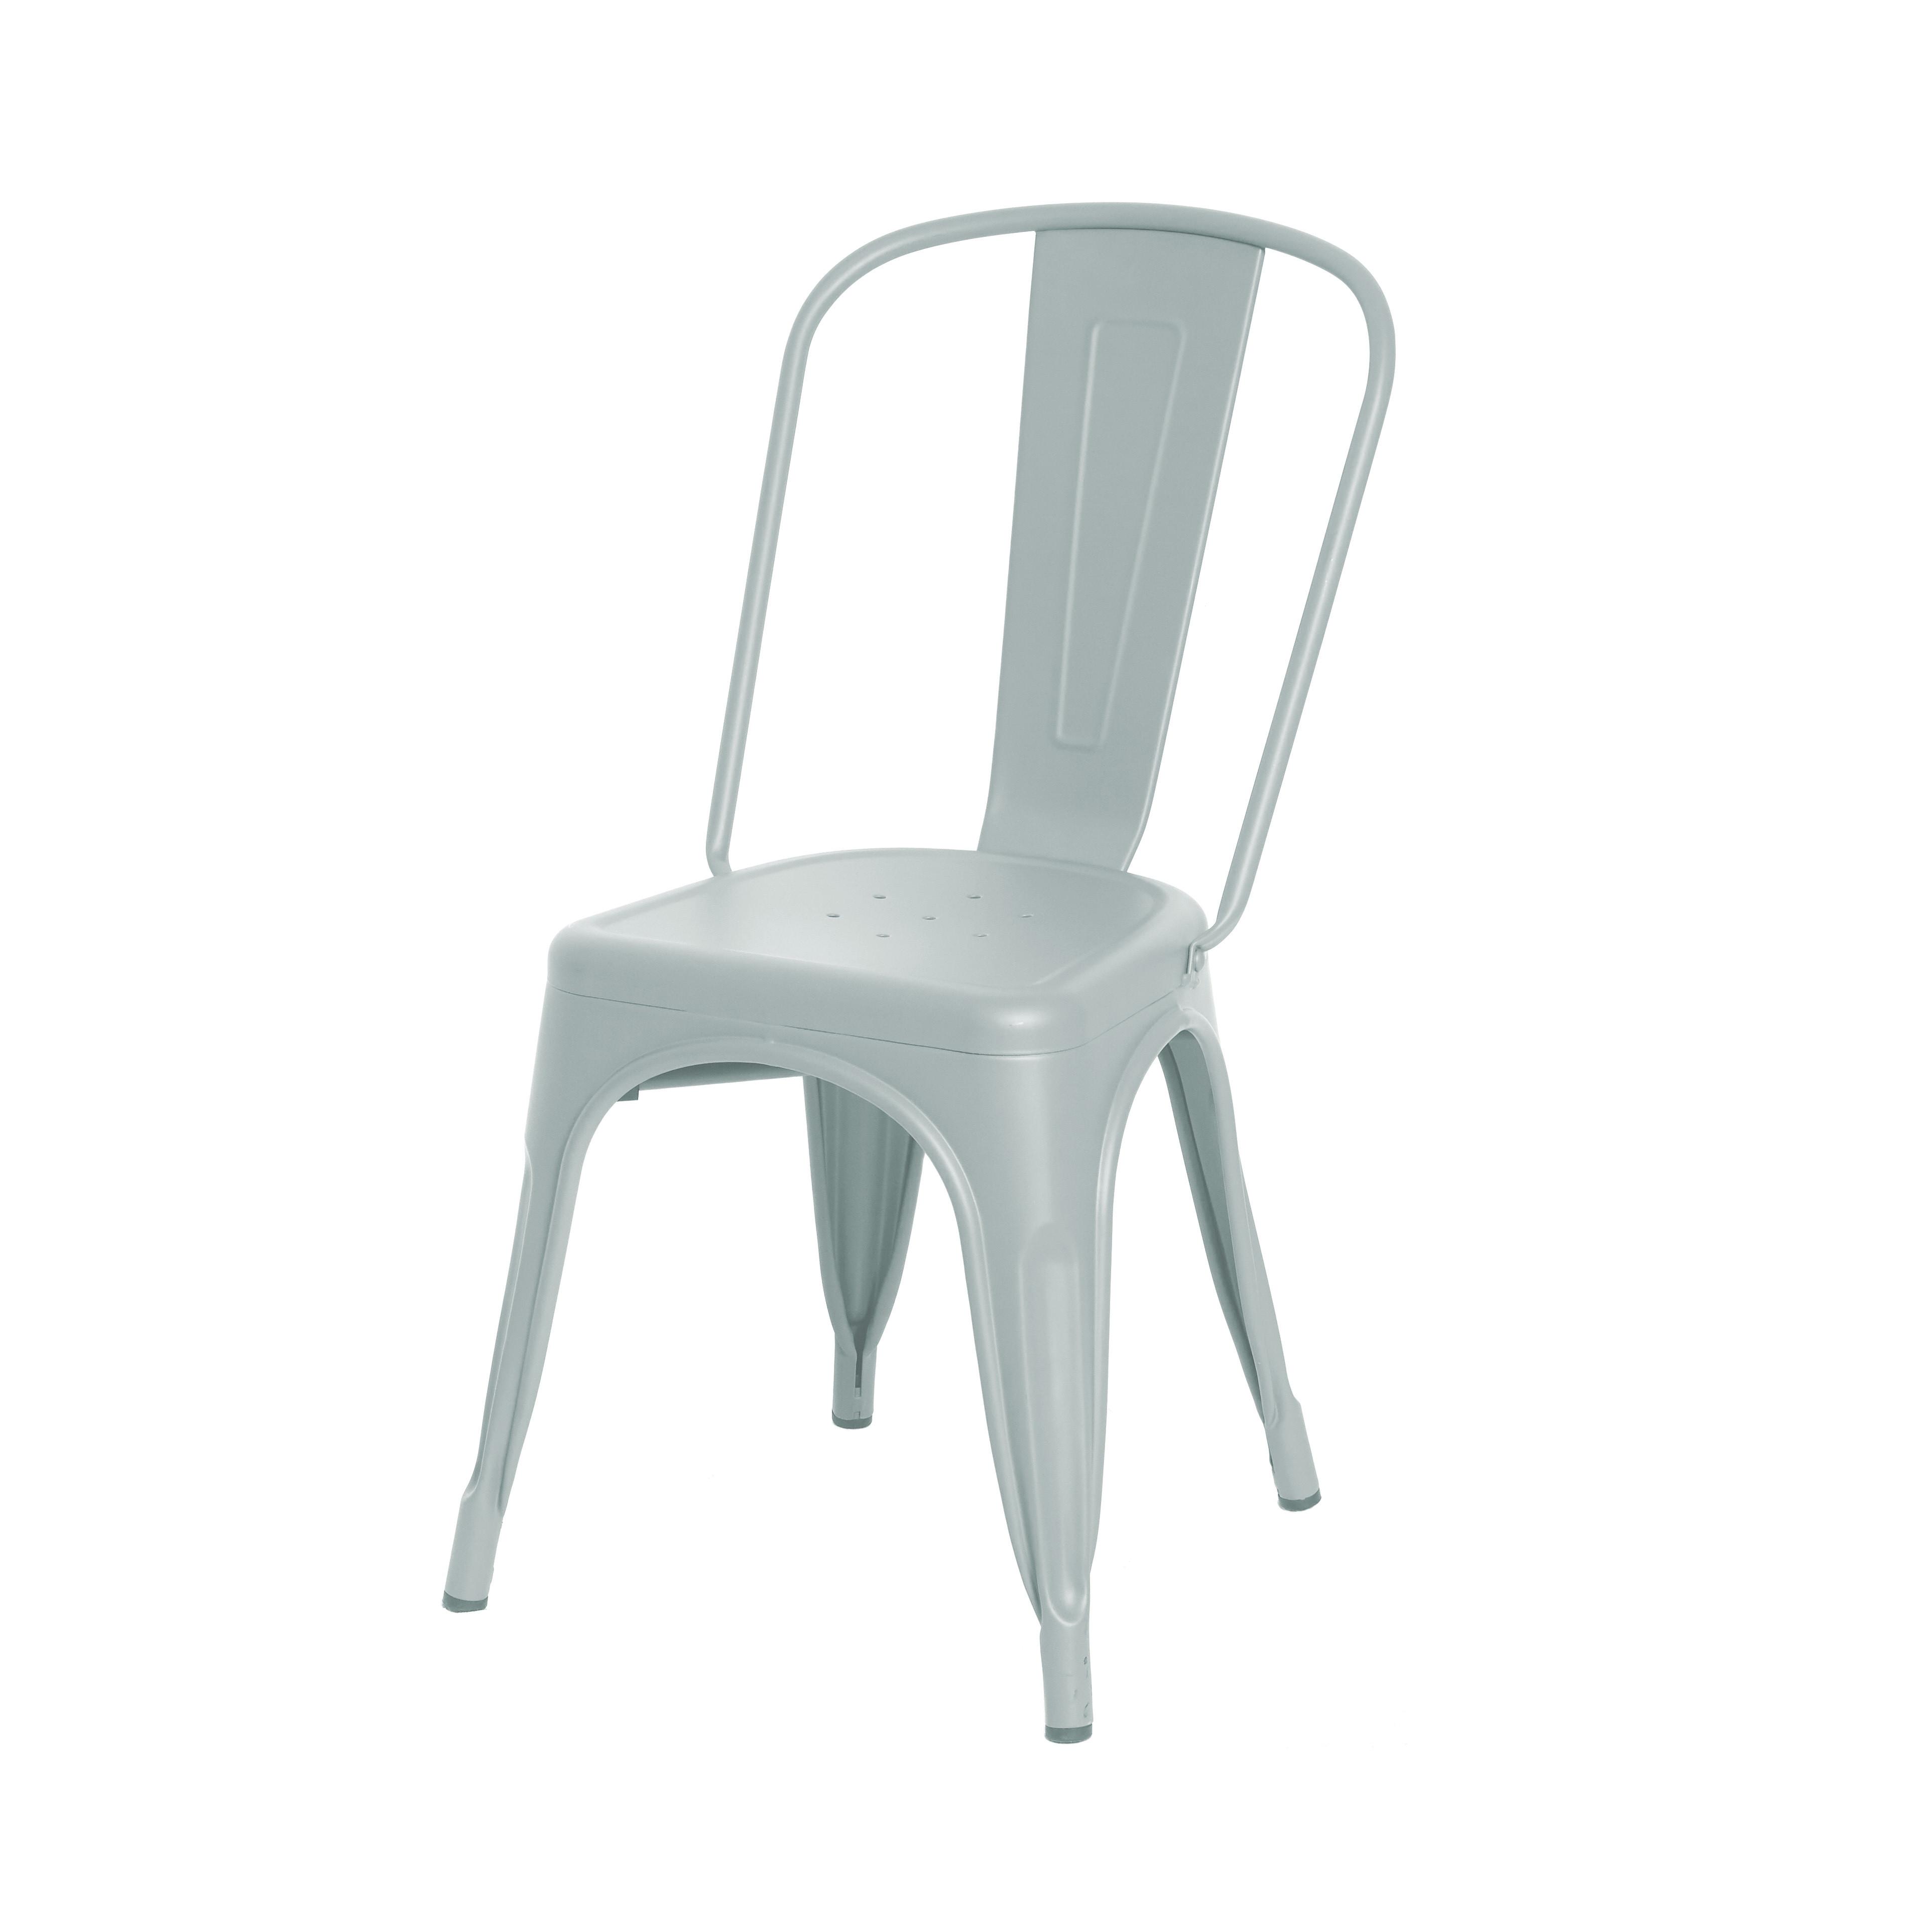 Sedia metallo verniciato Color Chair, Grigio chiaro, large image number 0